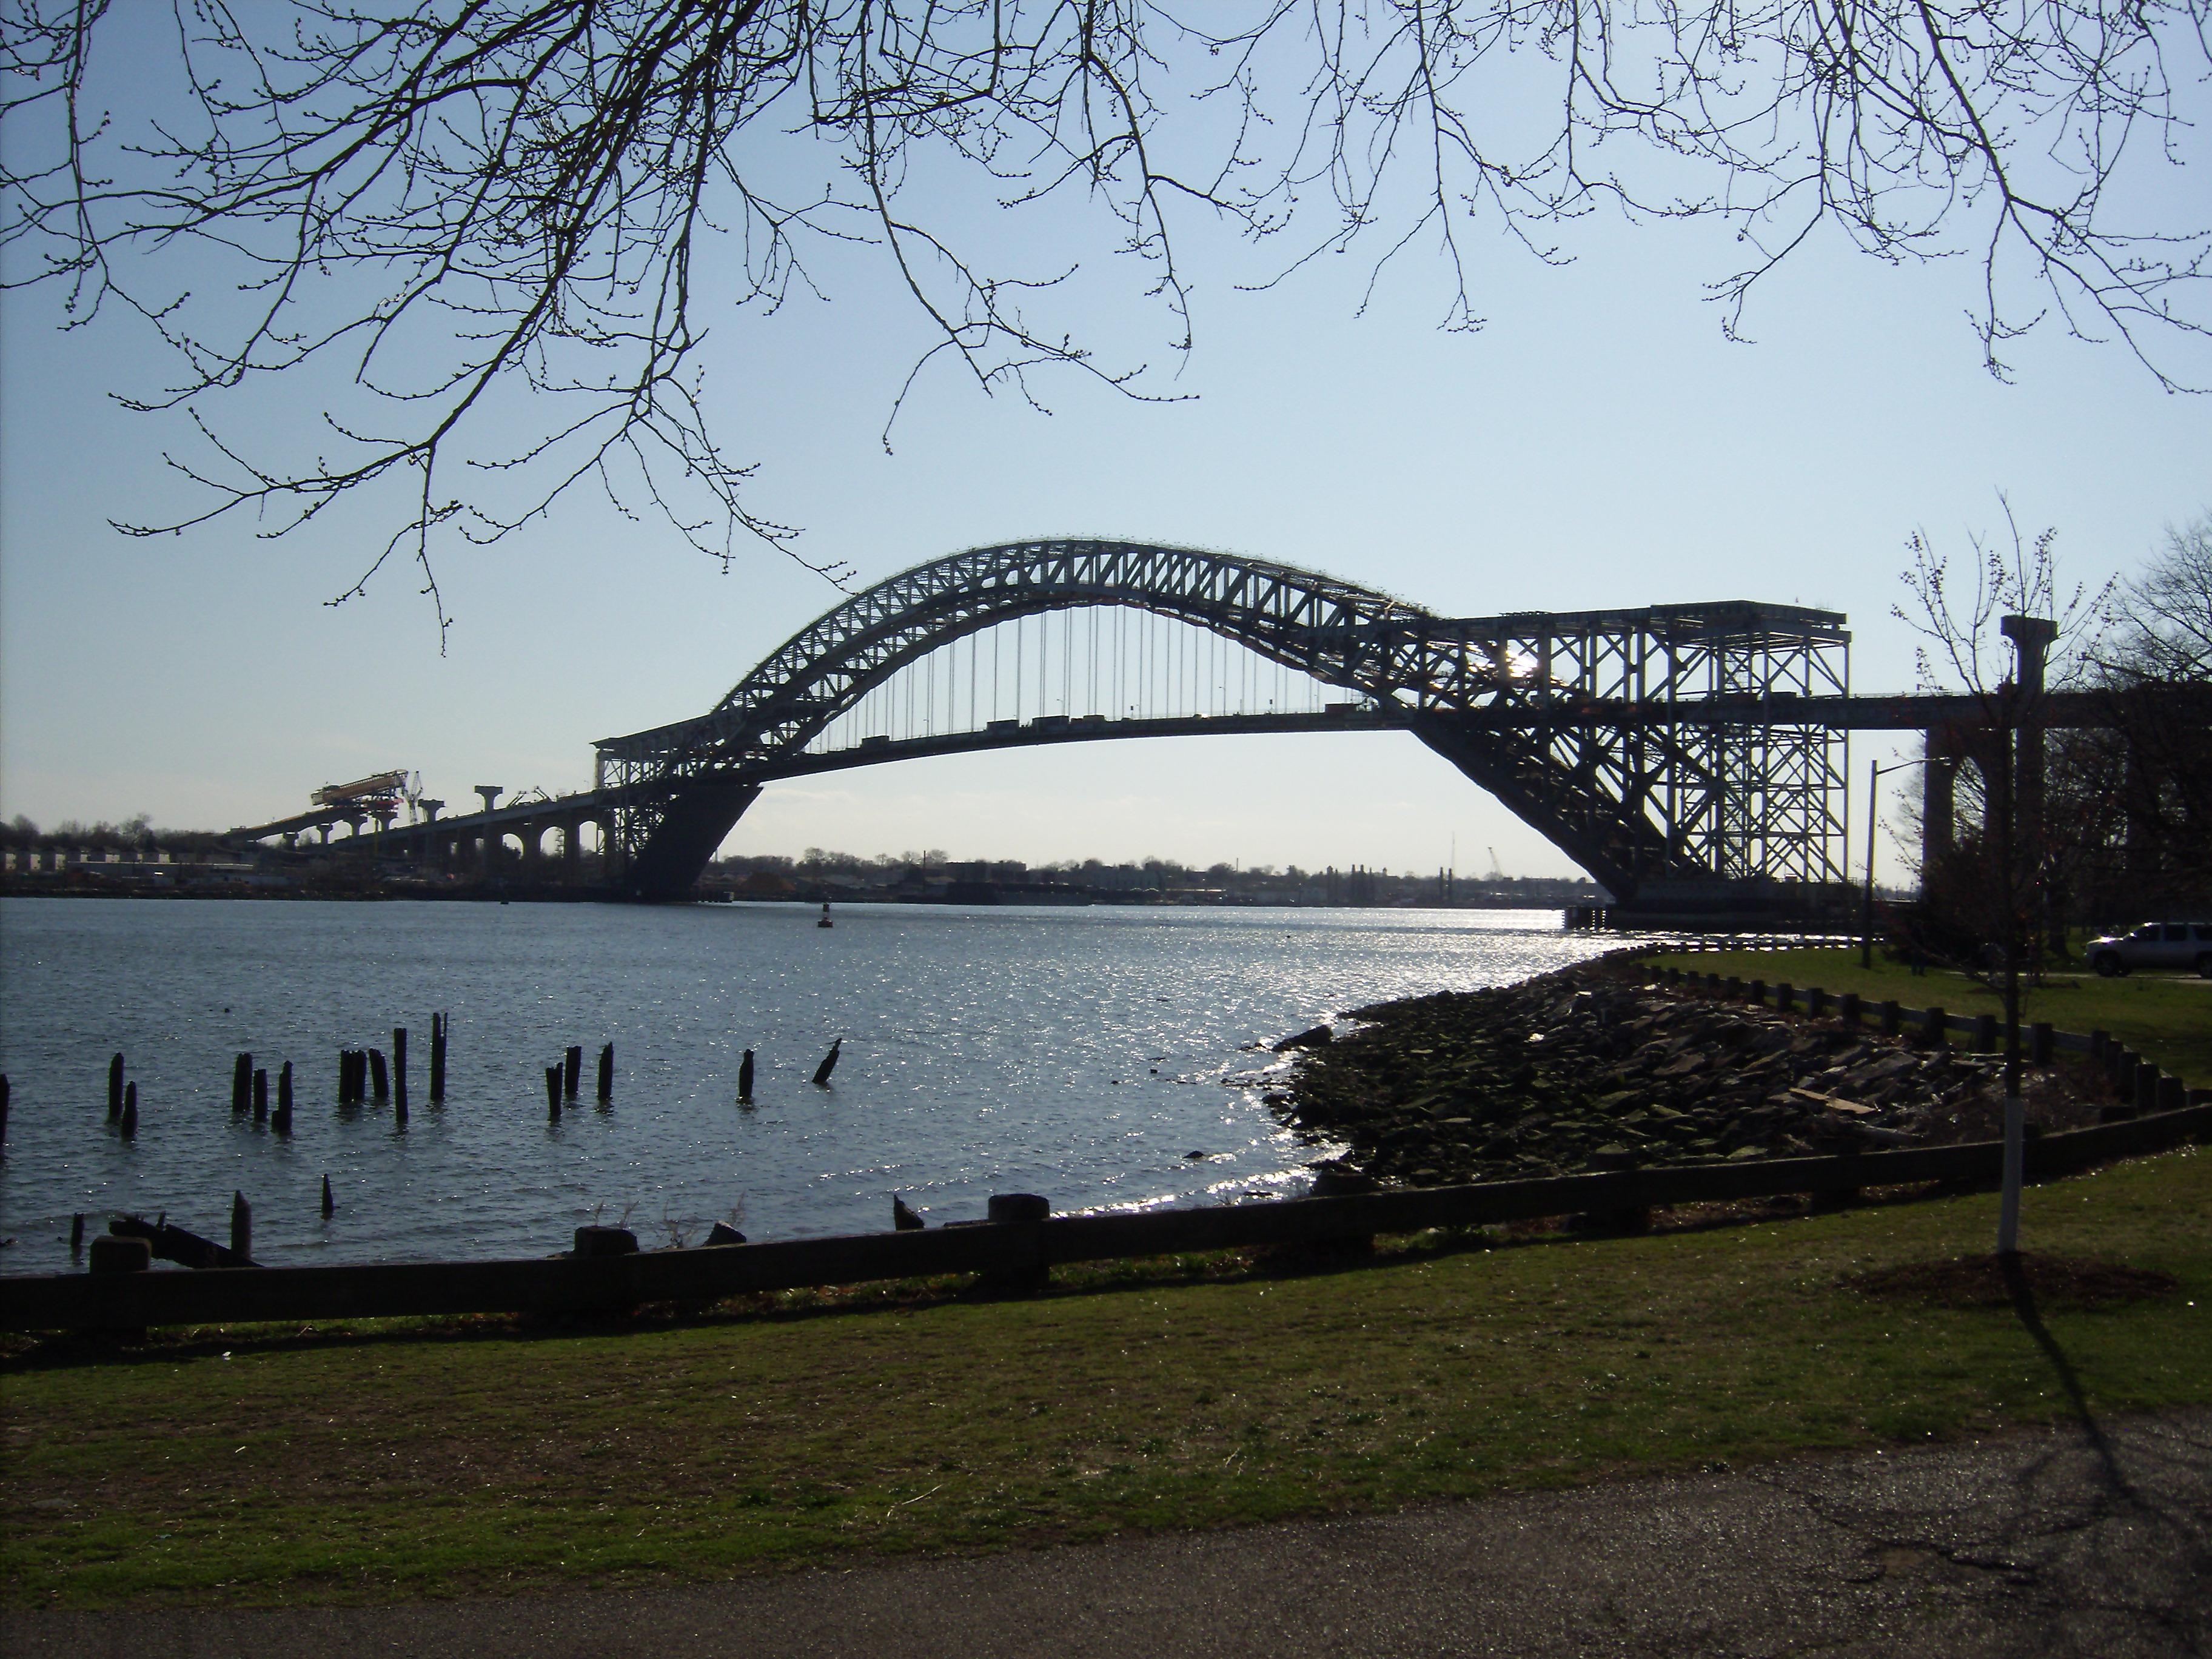 553a6aa266eb7fb8f4b9_Bayonne_Bridge.JPG